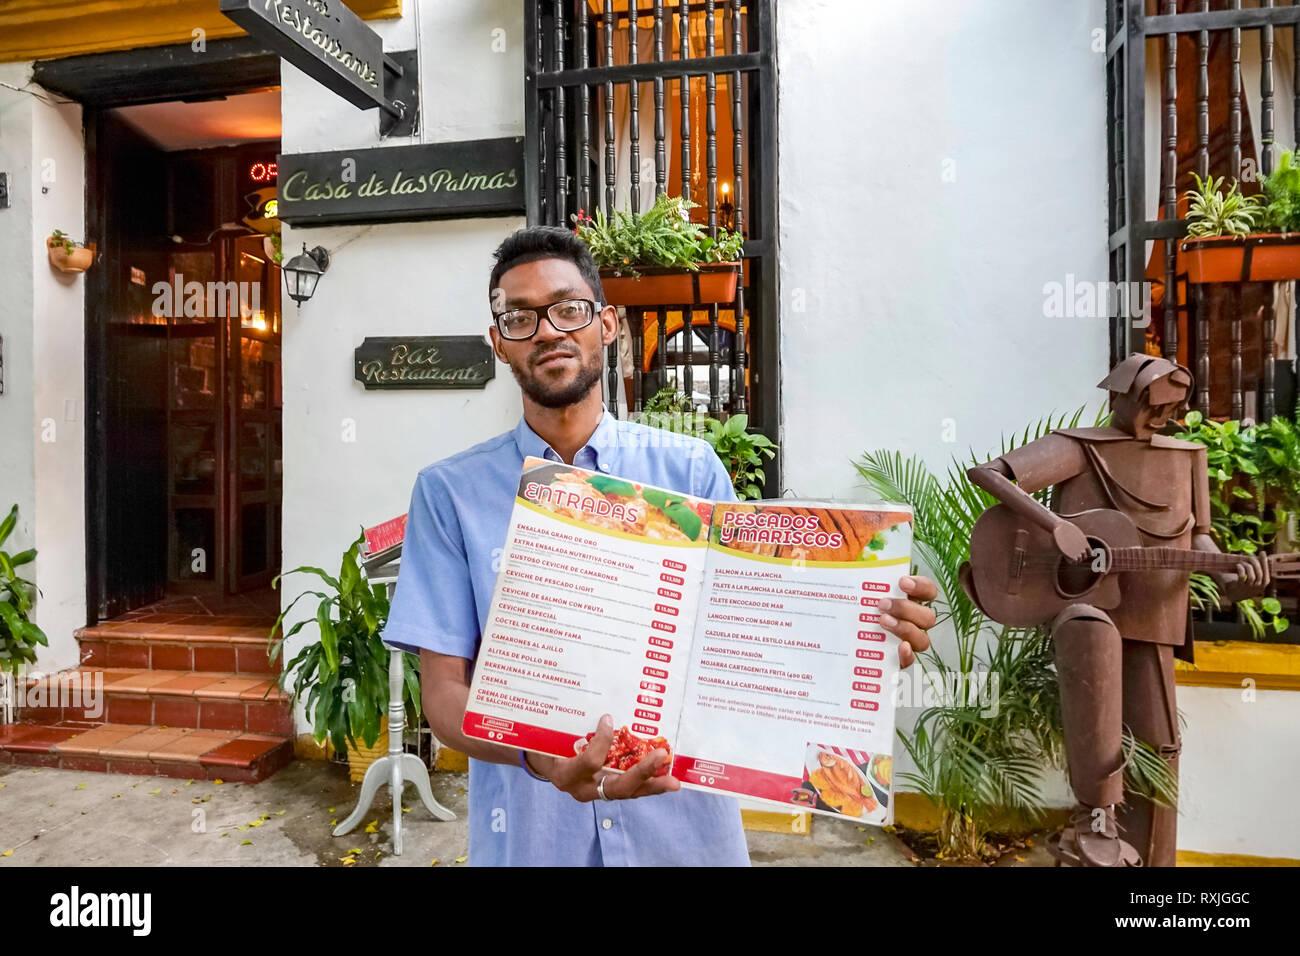 Cartagena Colombia Old Walled City Center centre Getsemani Hispanic man Casa de las Palmas restaurant host manager offering menu Spanish language - Stock Image